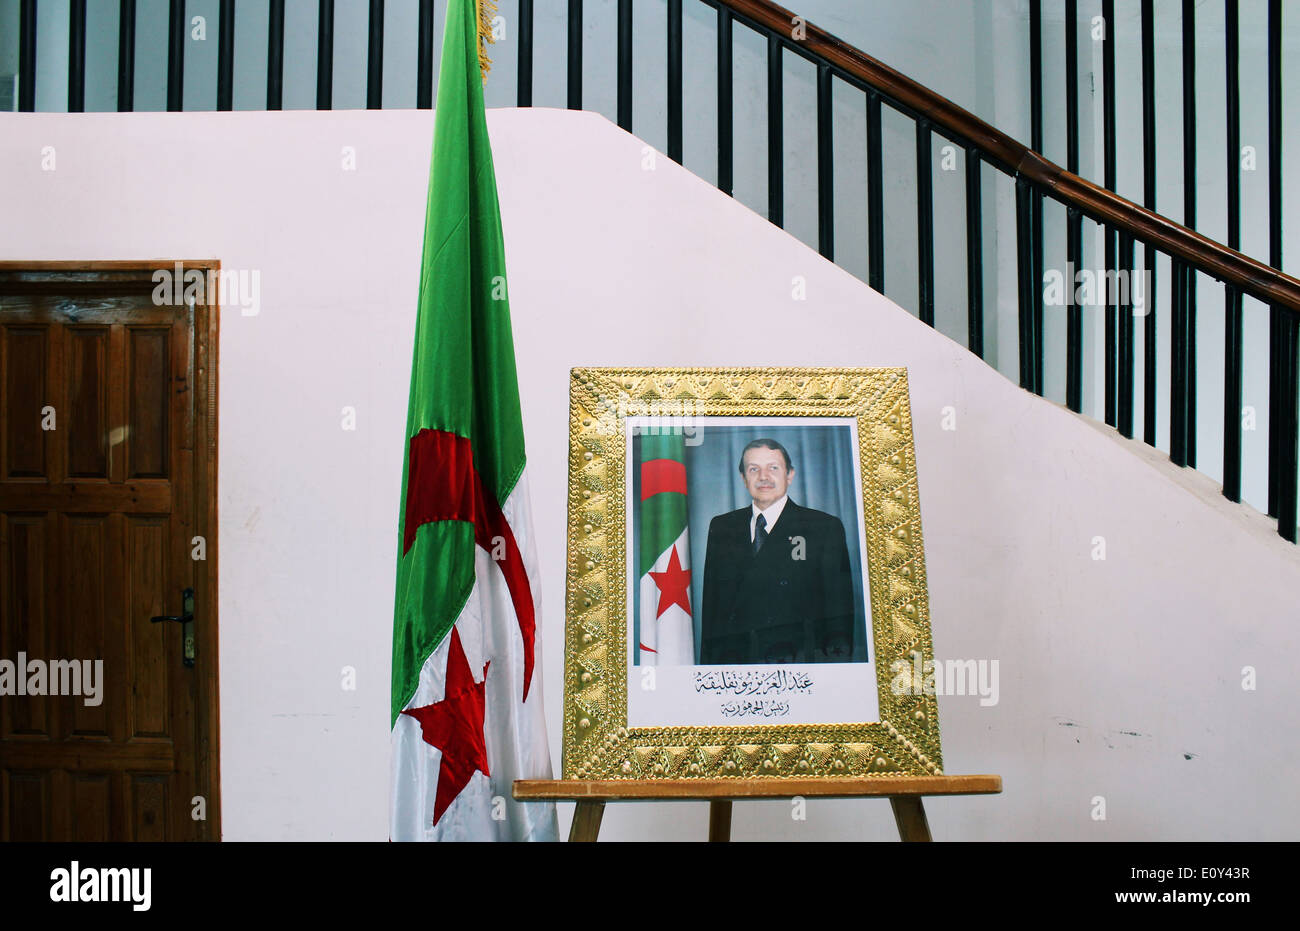 Retrato del Presidente argelino en M'sila, Argelia. Imagen De Stock